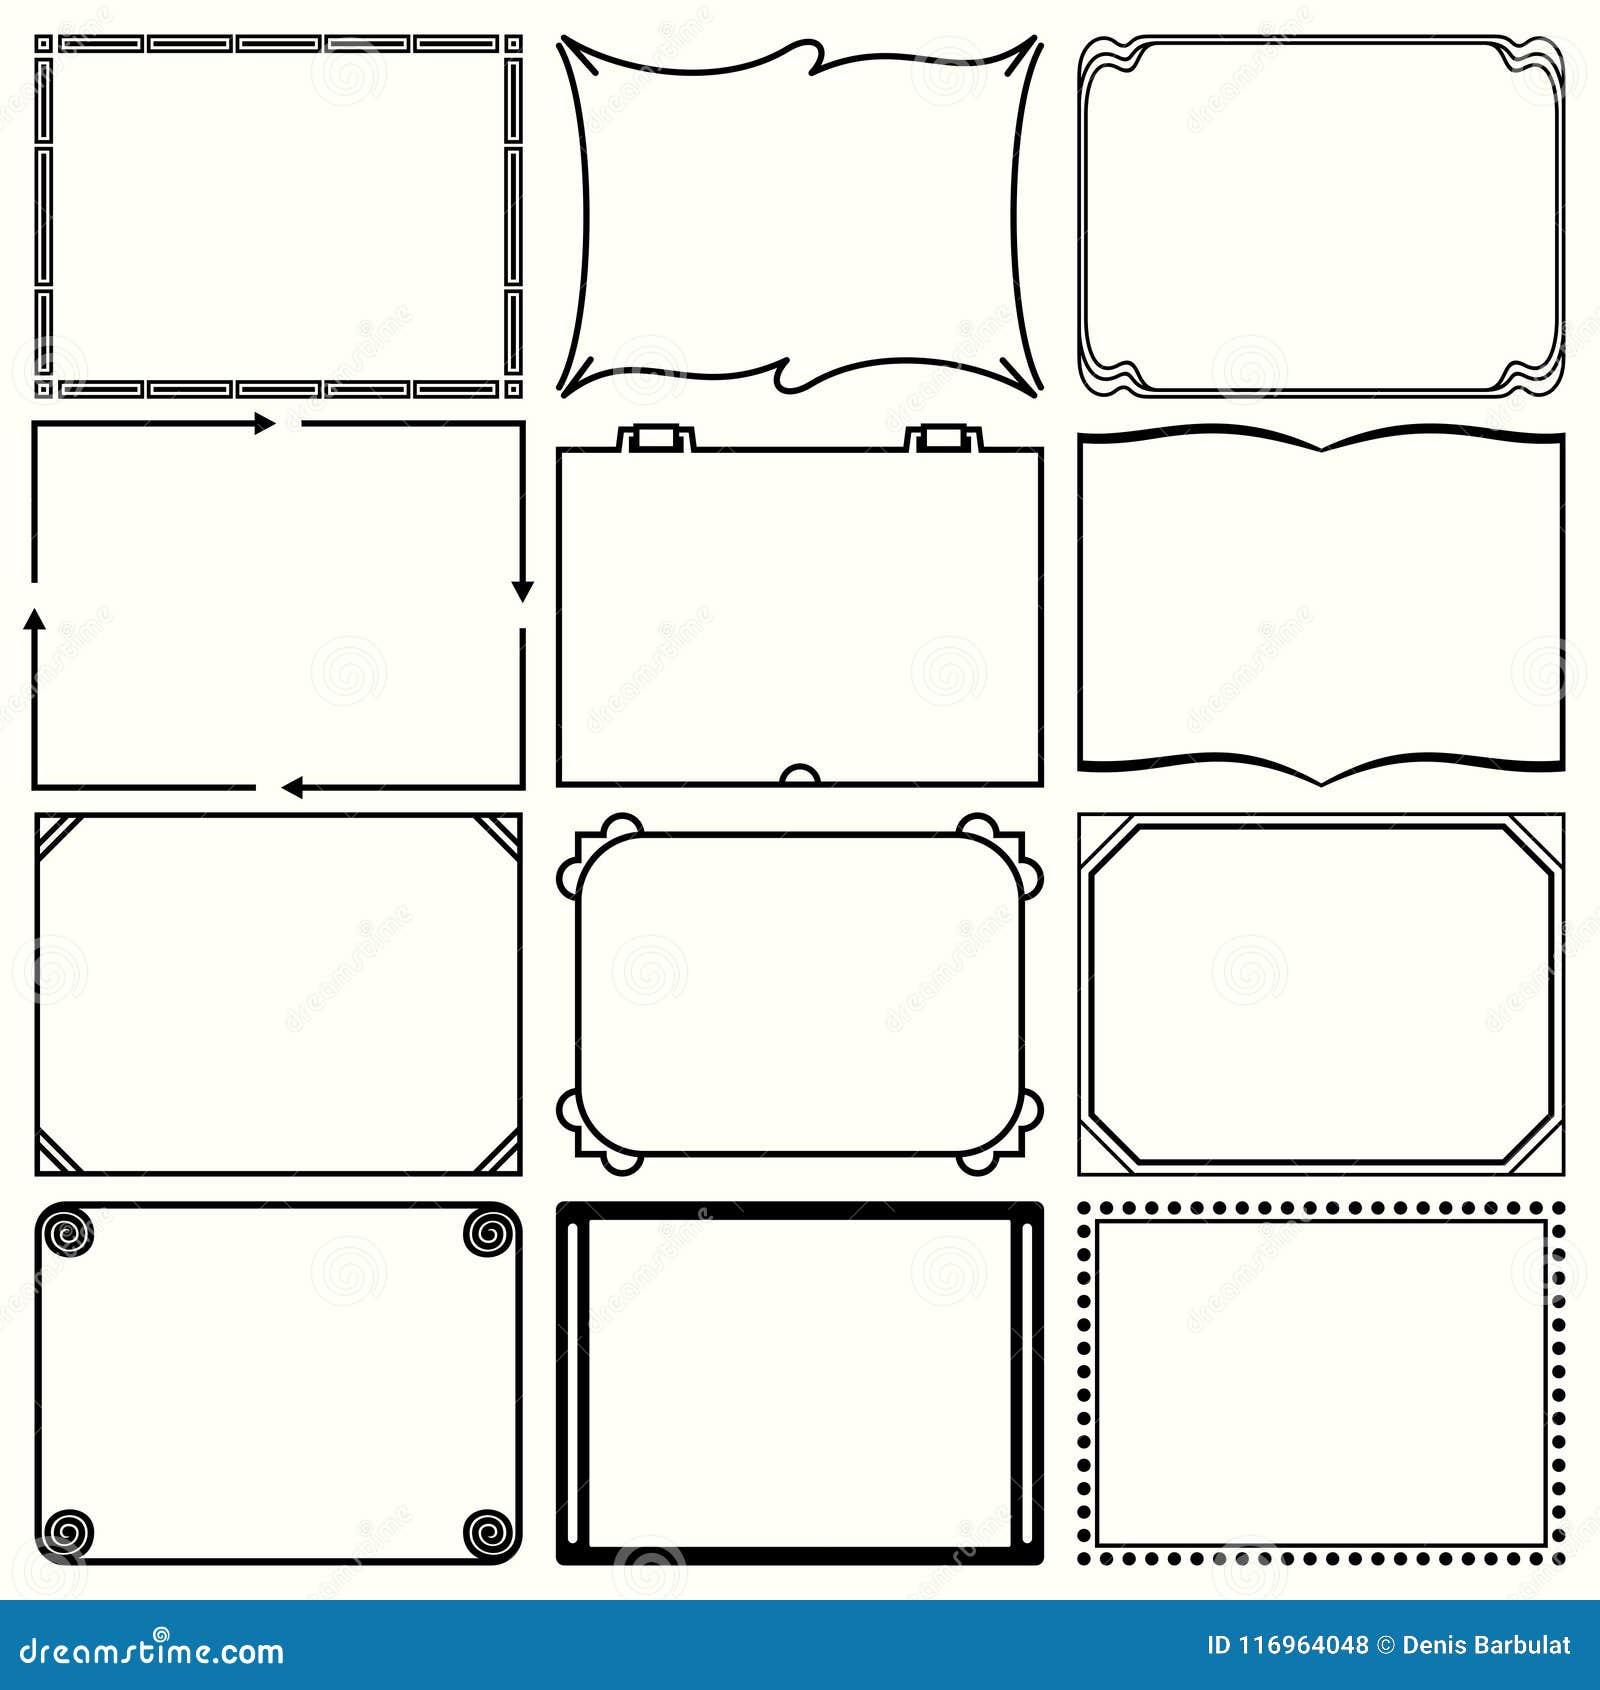 Decorative Simple Frames Set 12 Stock Vector - Illustration of deco ...